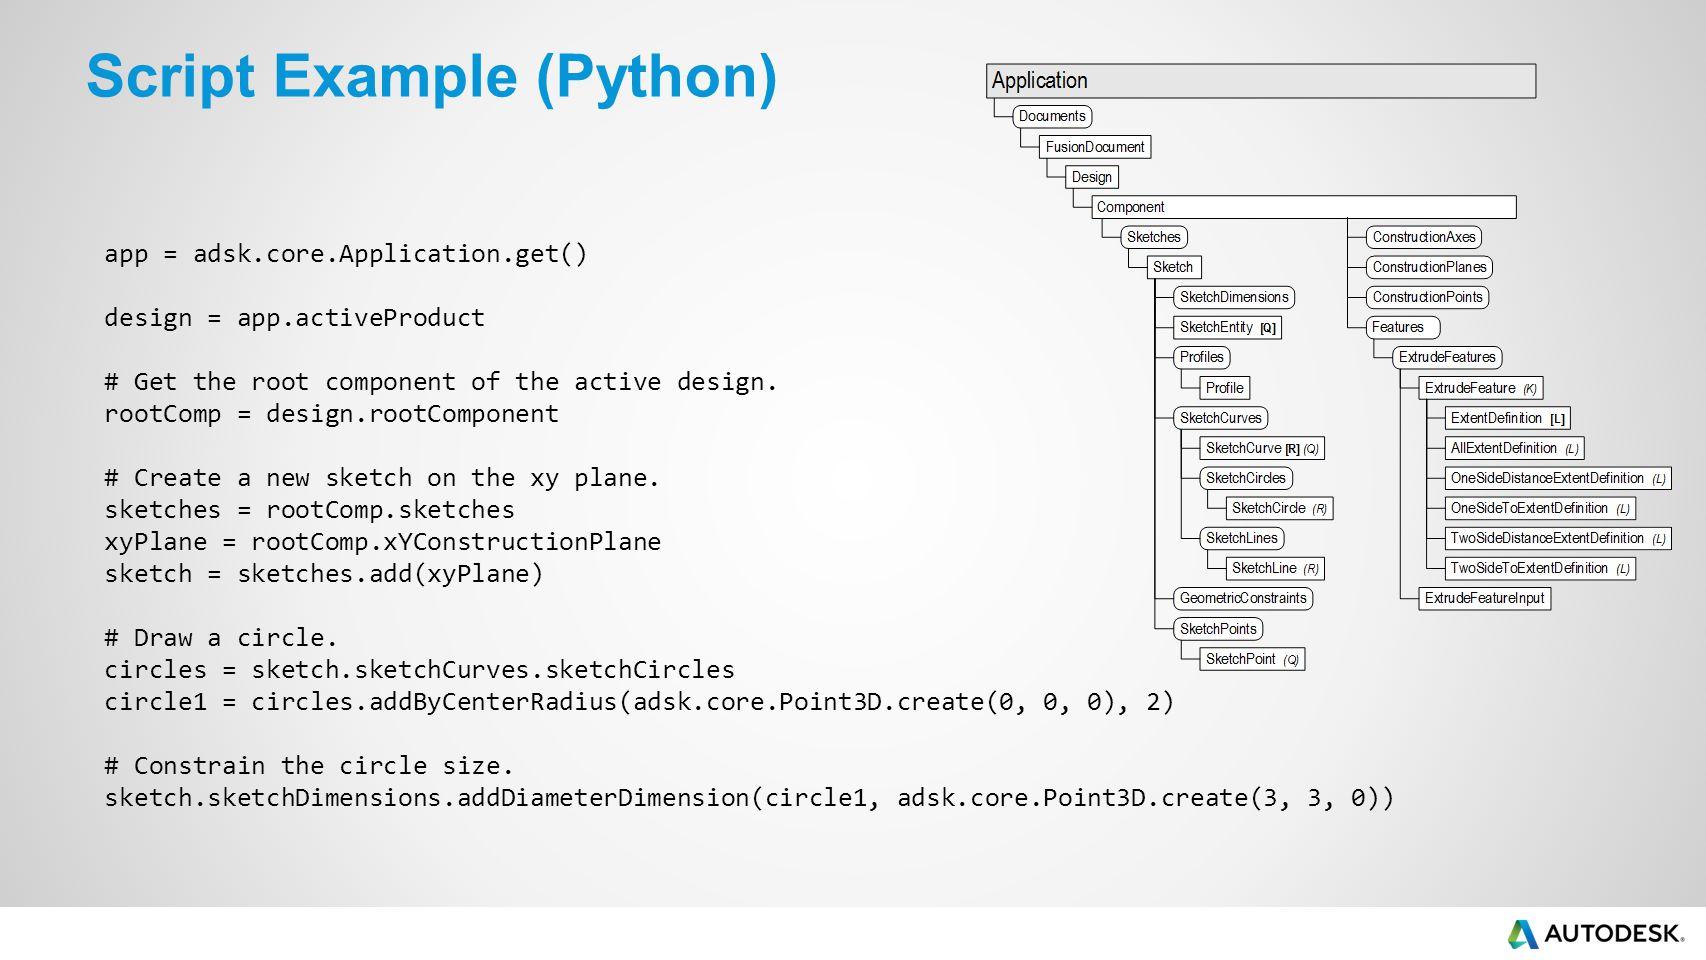 Script Example (Python)